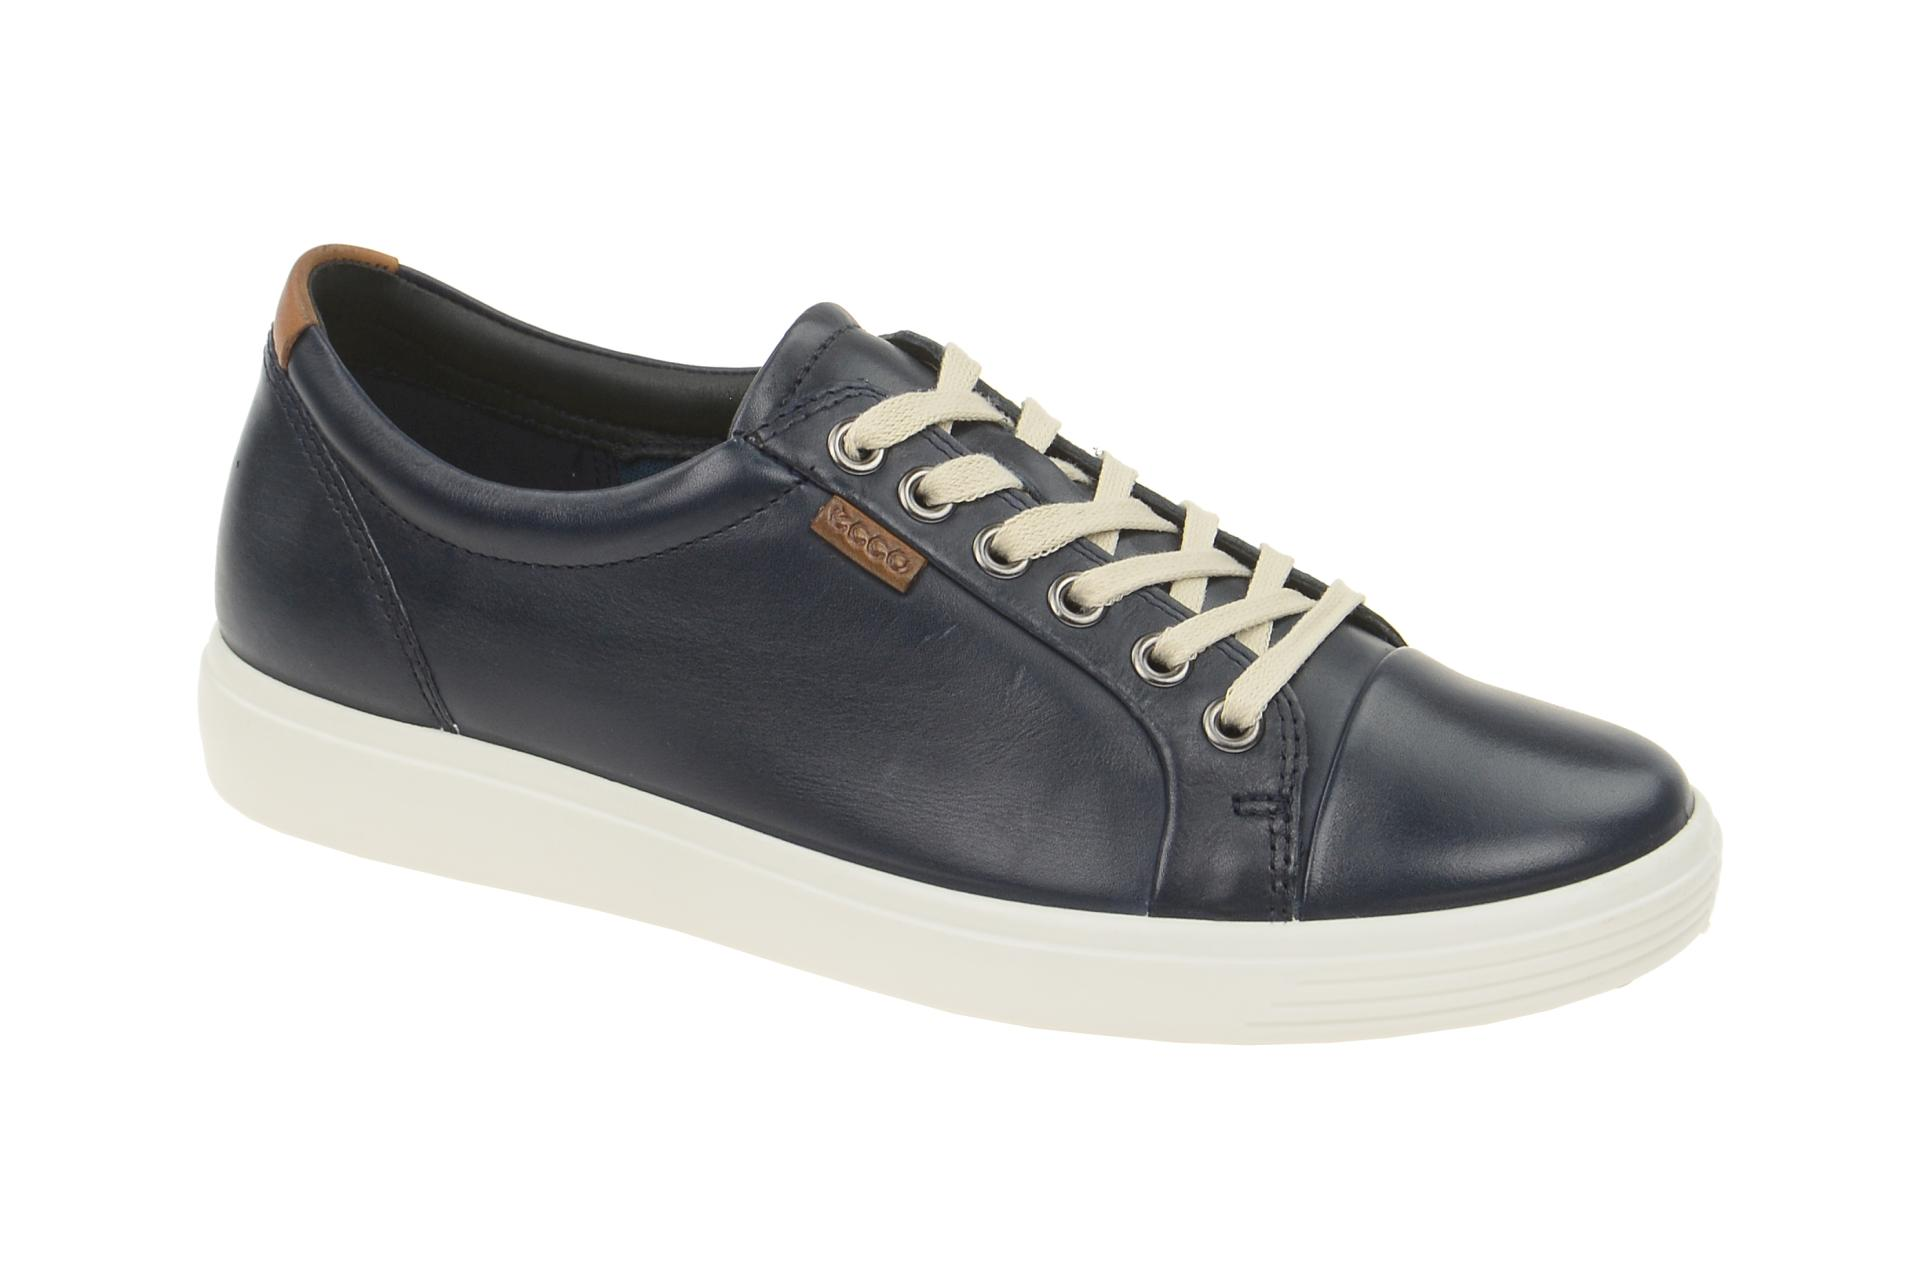 Ecco Soft 7 Schuhe blau Damen Sneakers - Schuhhaus Strauch Shop 0367d11a4f